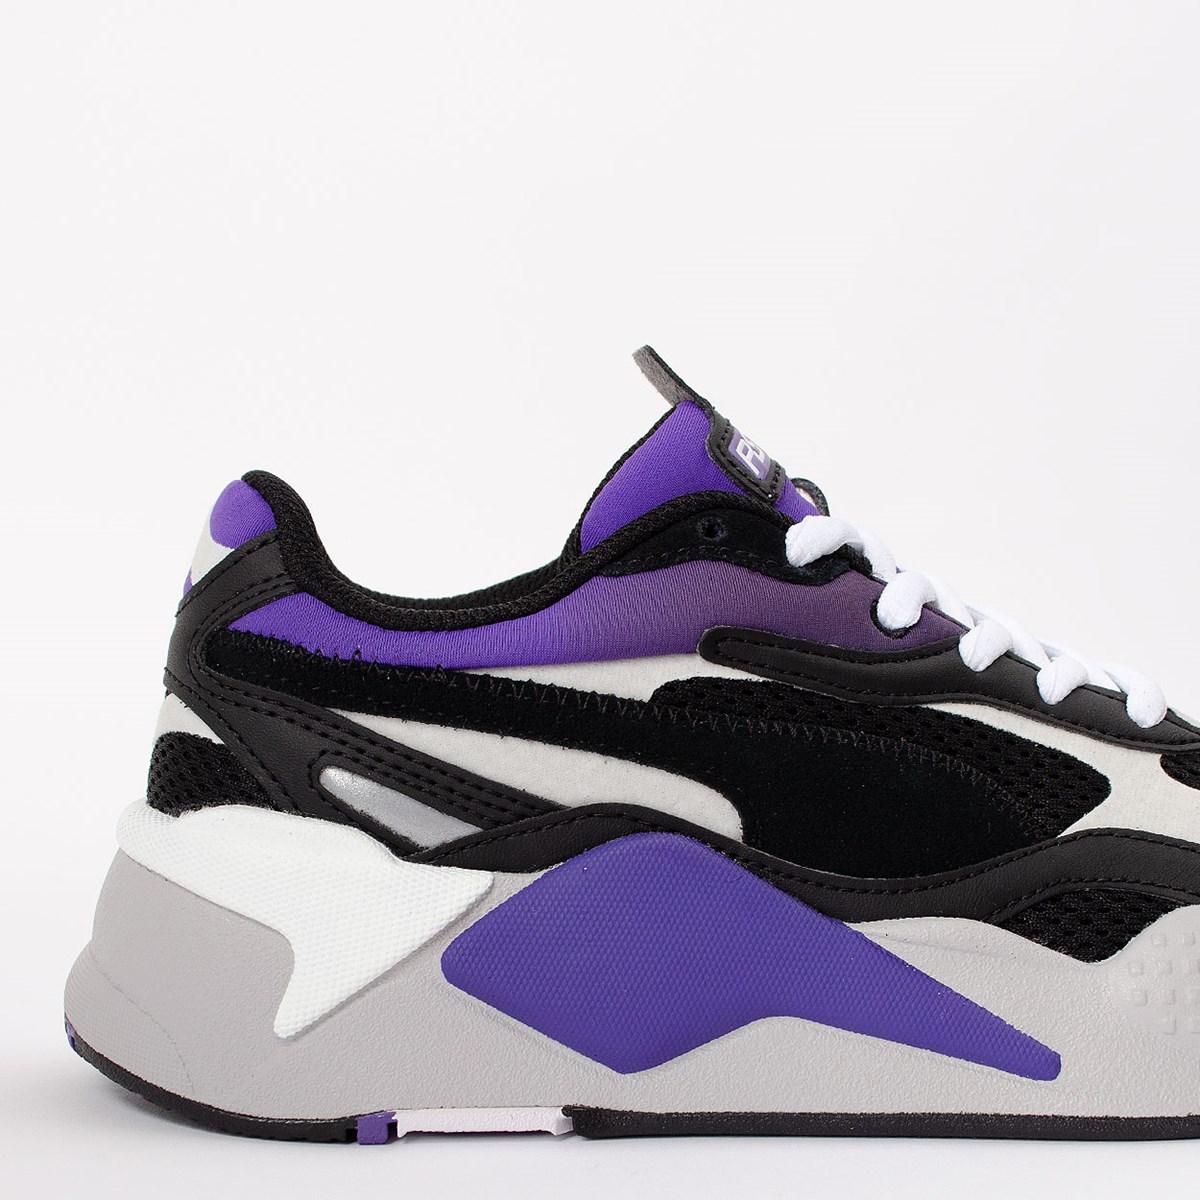 Tênis Puma RS-X3 Neo Fade Black Ultra Violet 373377-01